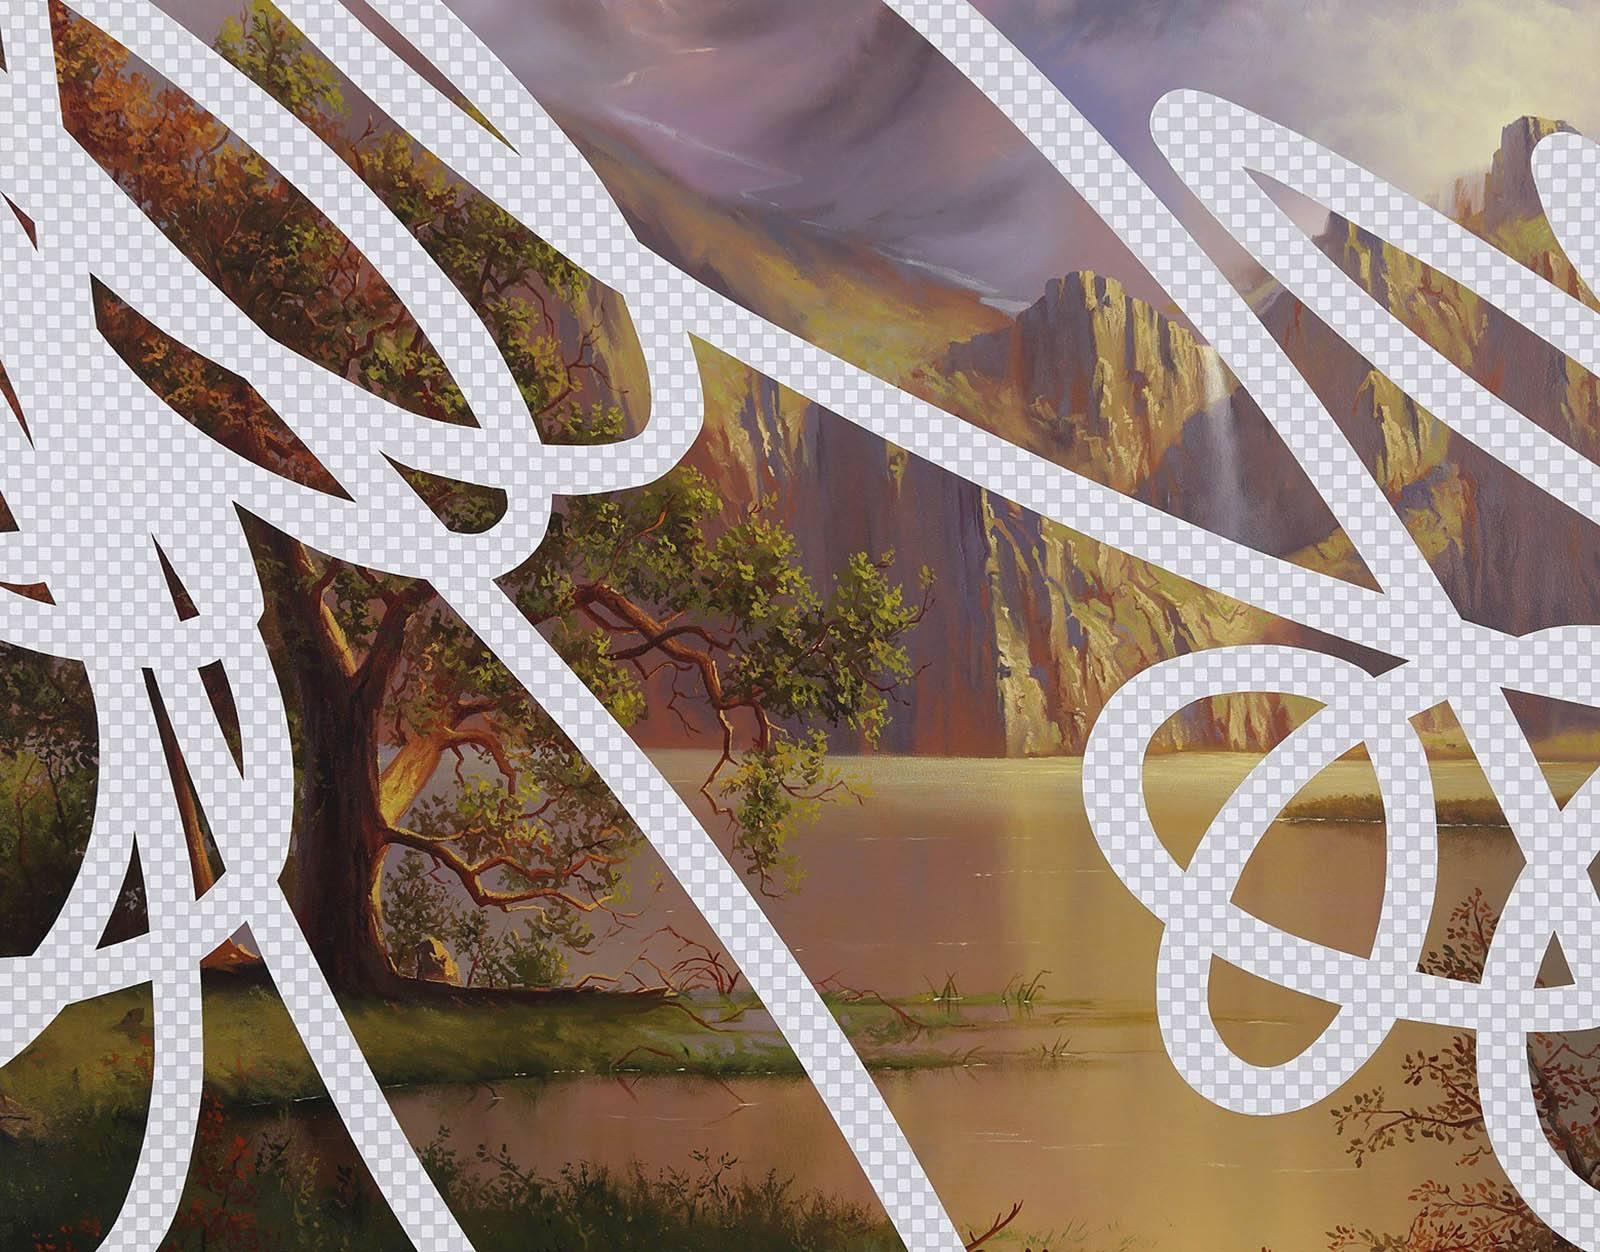 iGNANT-Art-Shawn-Huckins-Fools-Gold-006